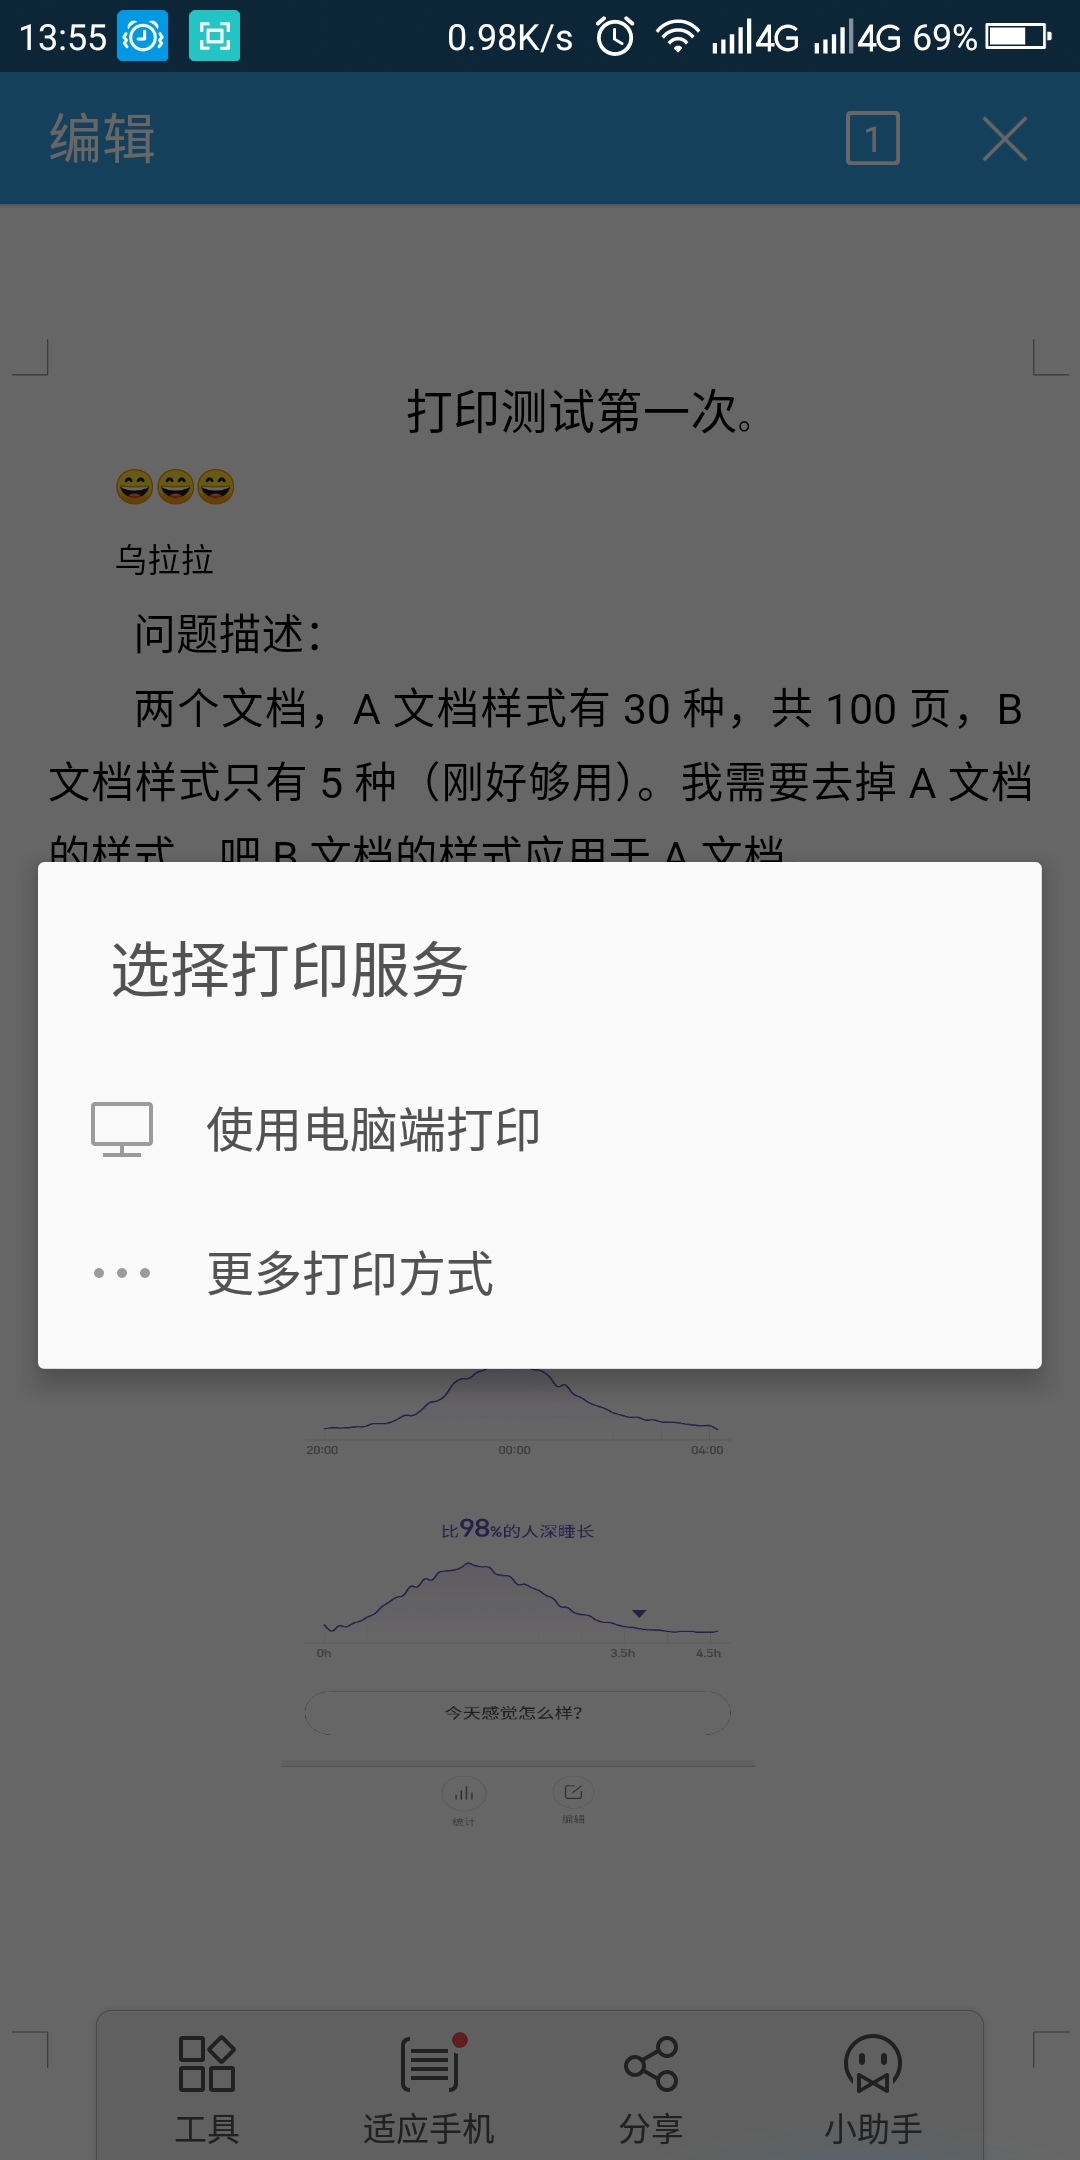 Screenshot_2018-11-21-13-55-09.png